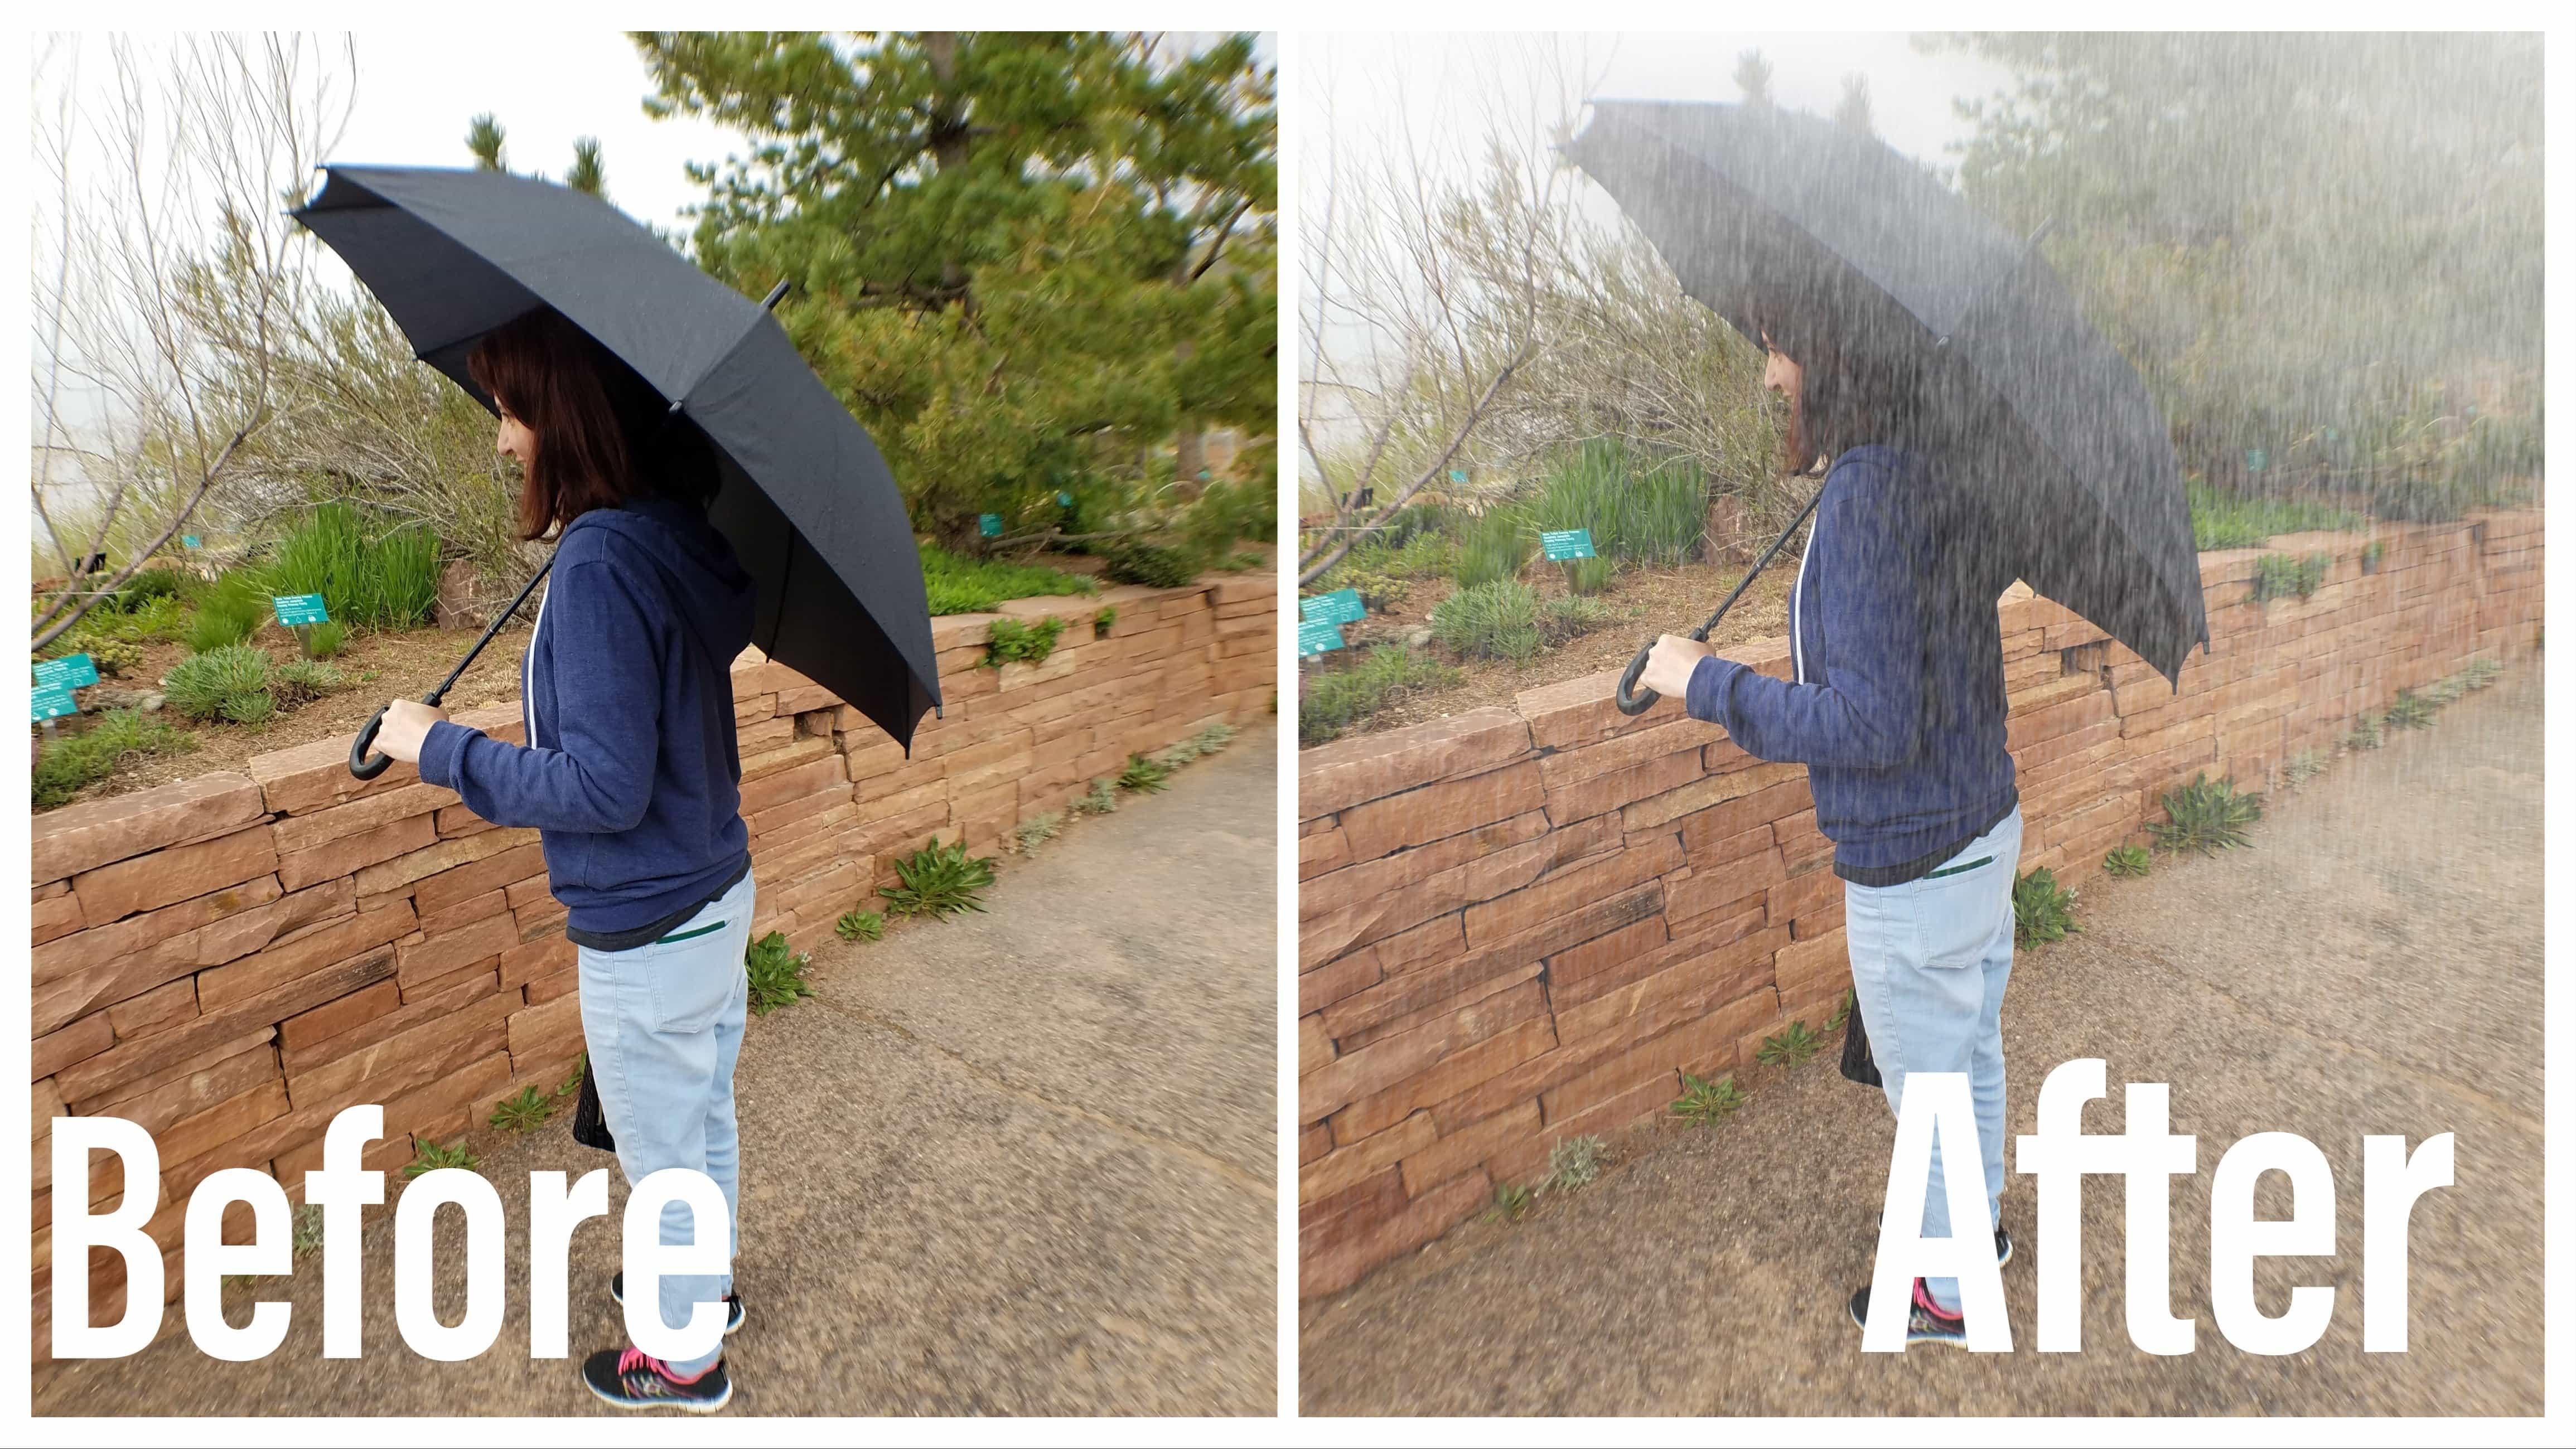 Lens Distortions Rain